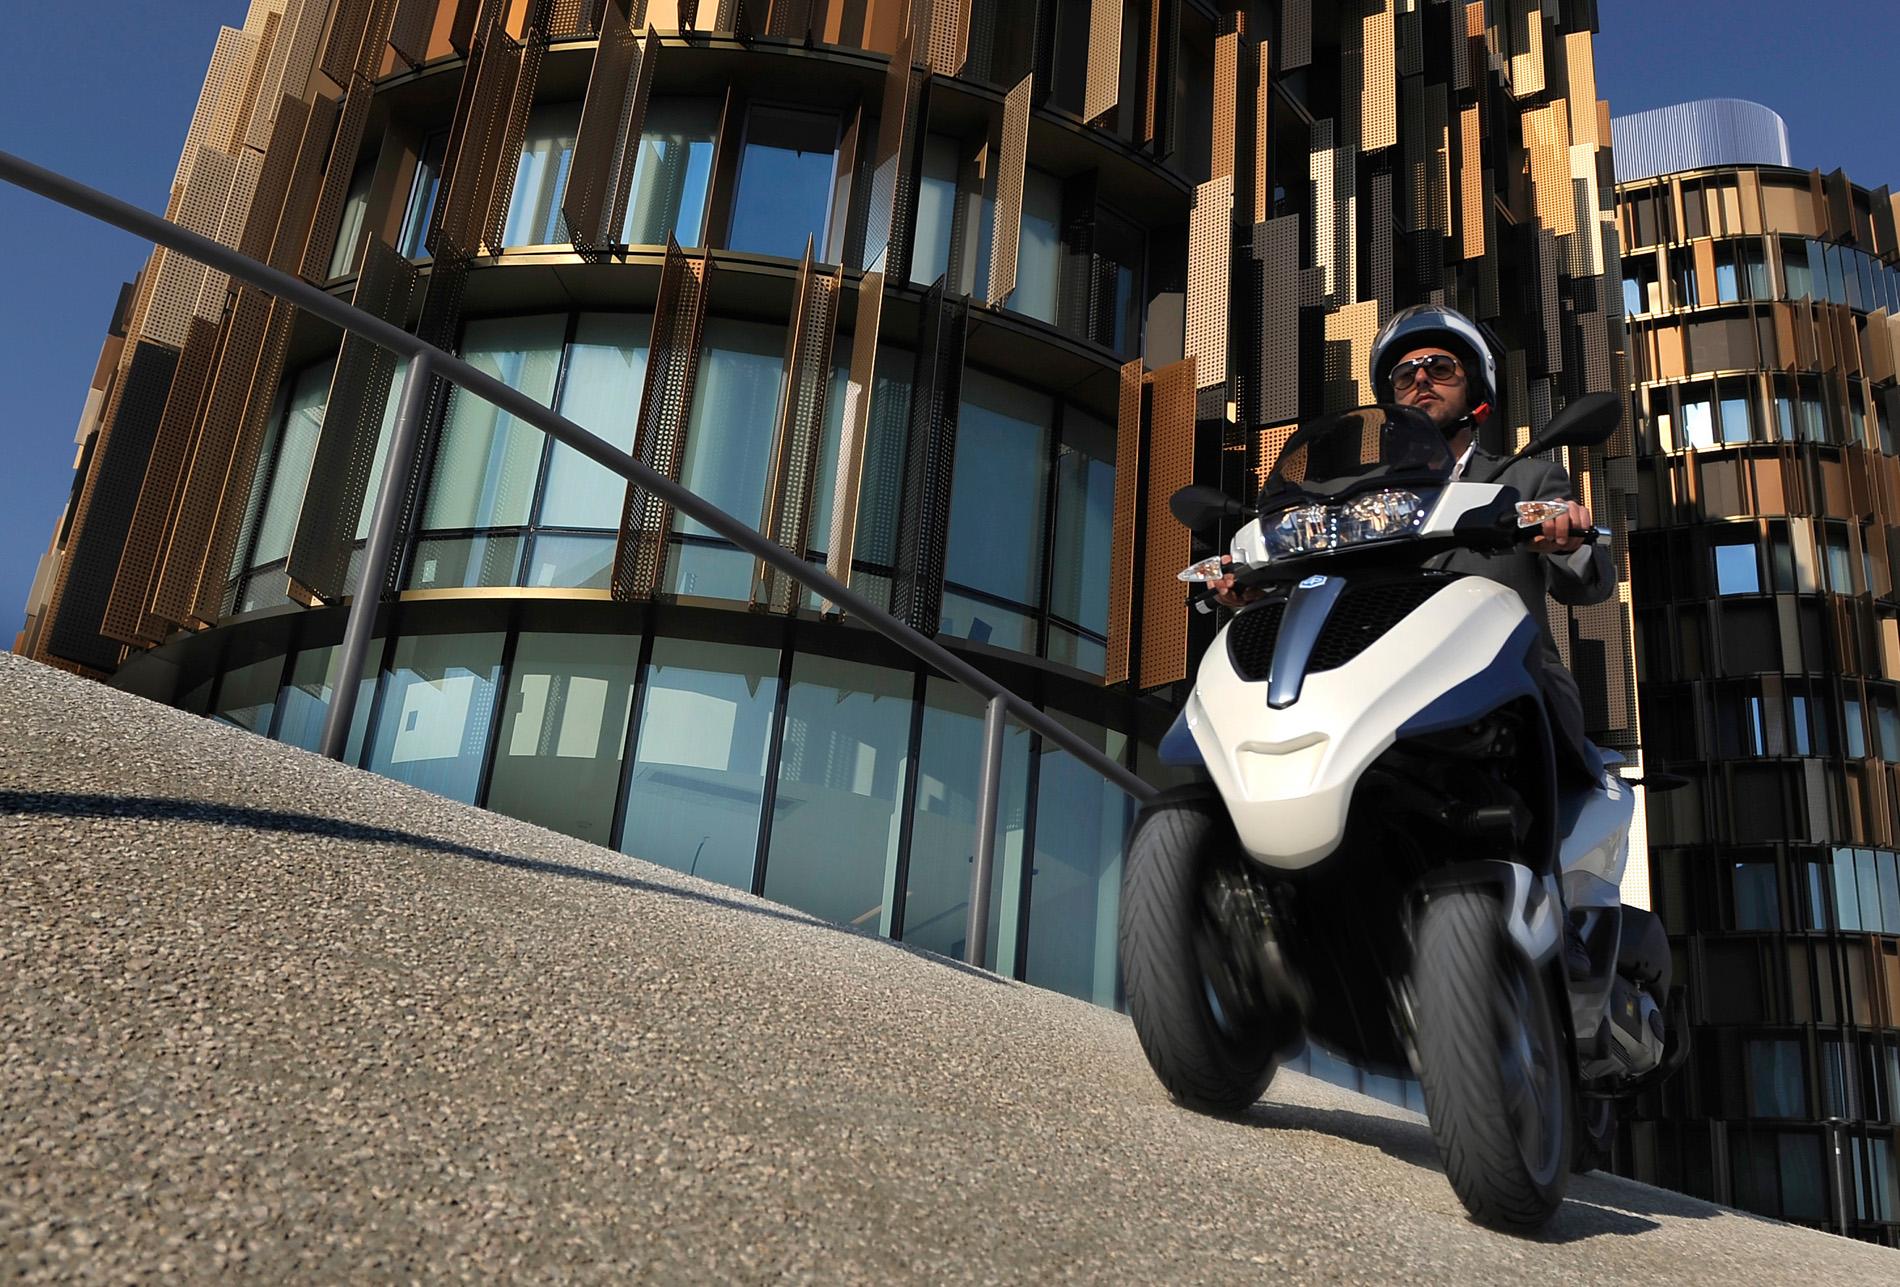 Scooter Piaggio - Le Biclou, votre concession à La BridoireScooter Piaggio - Le Biclou, votre concession à La Bridoire